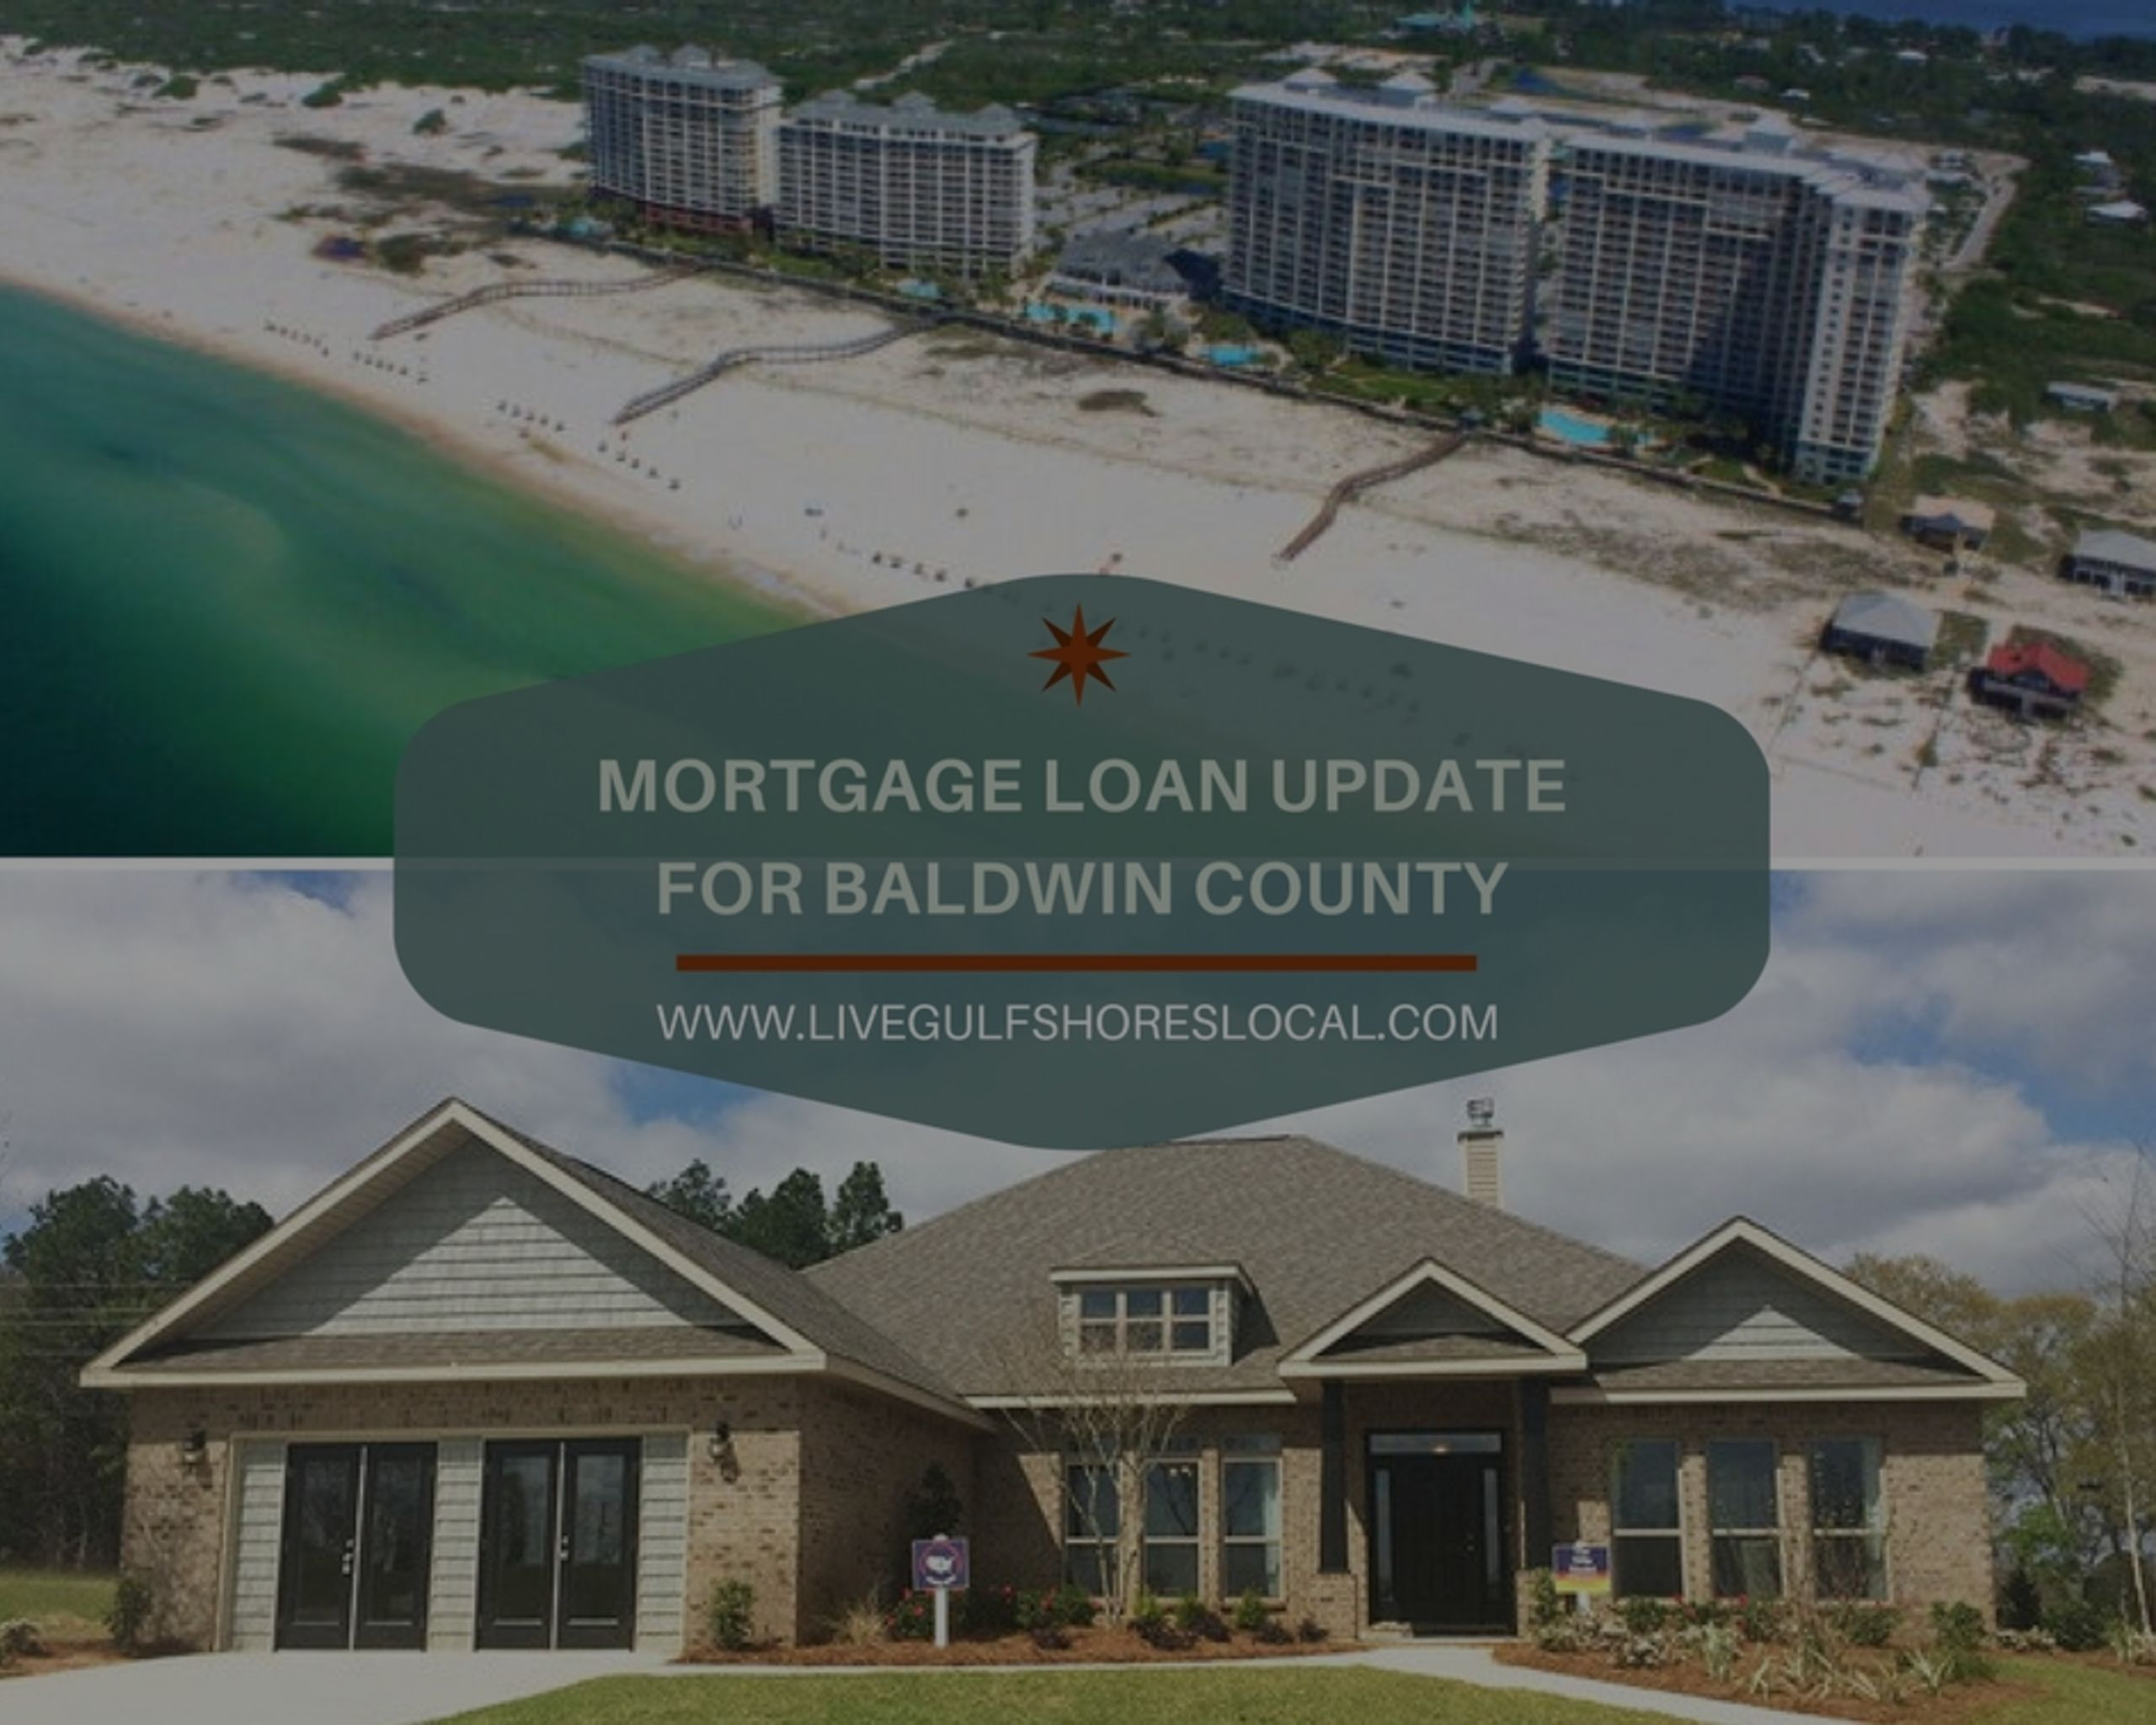 Mortgage Loan Update for Baldwin County